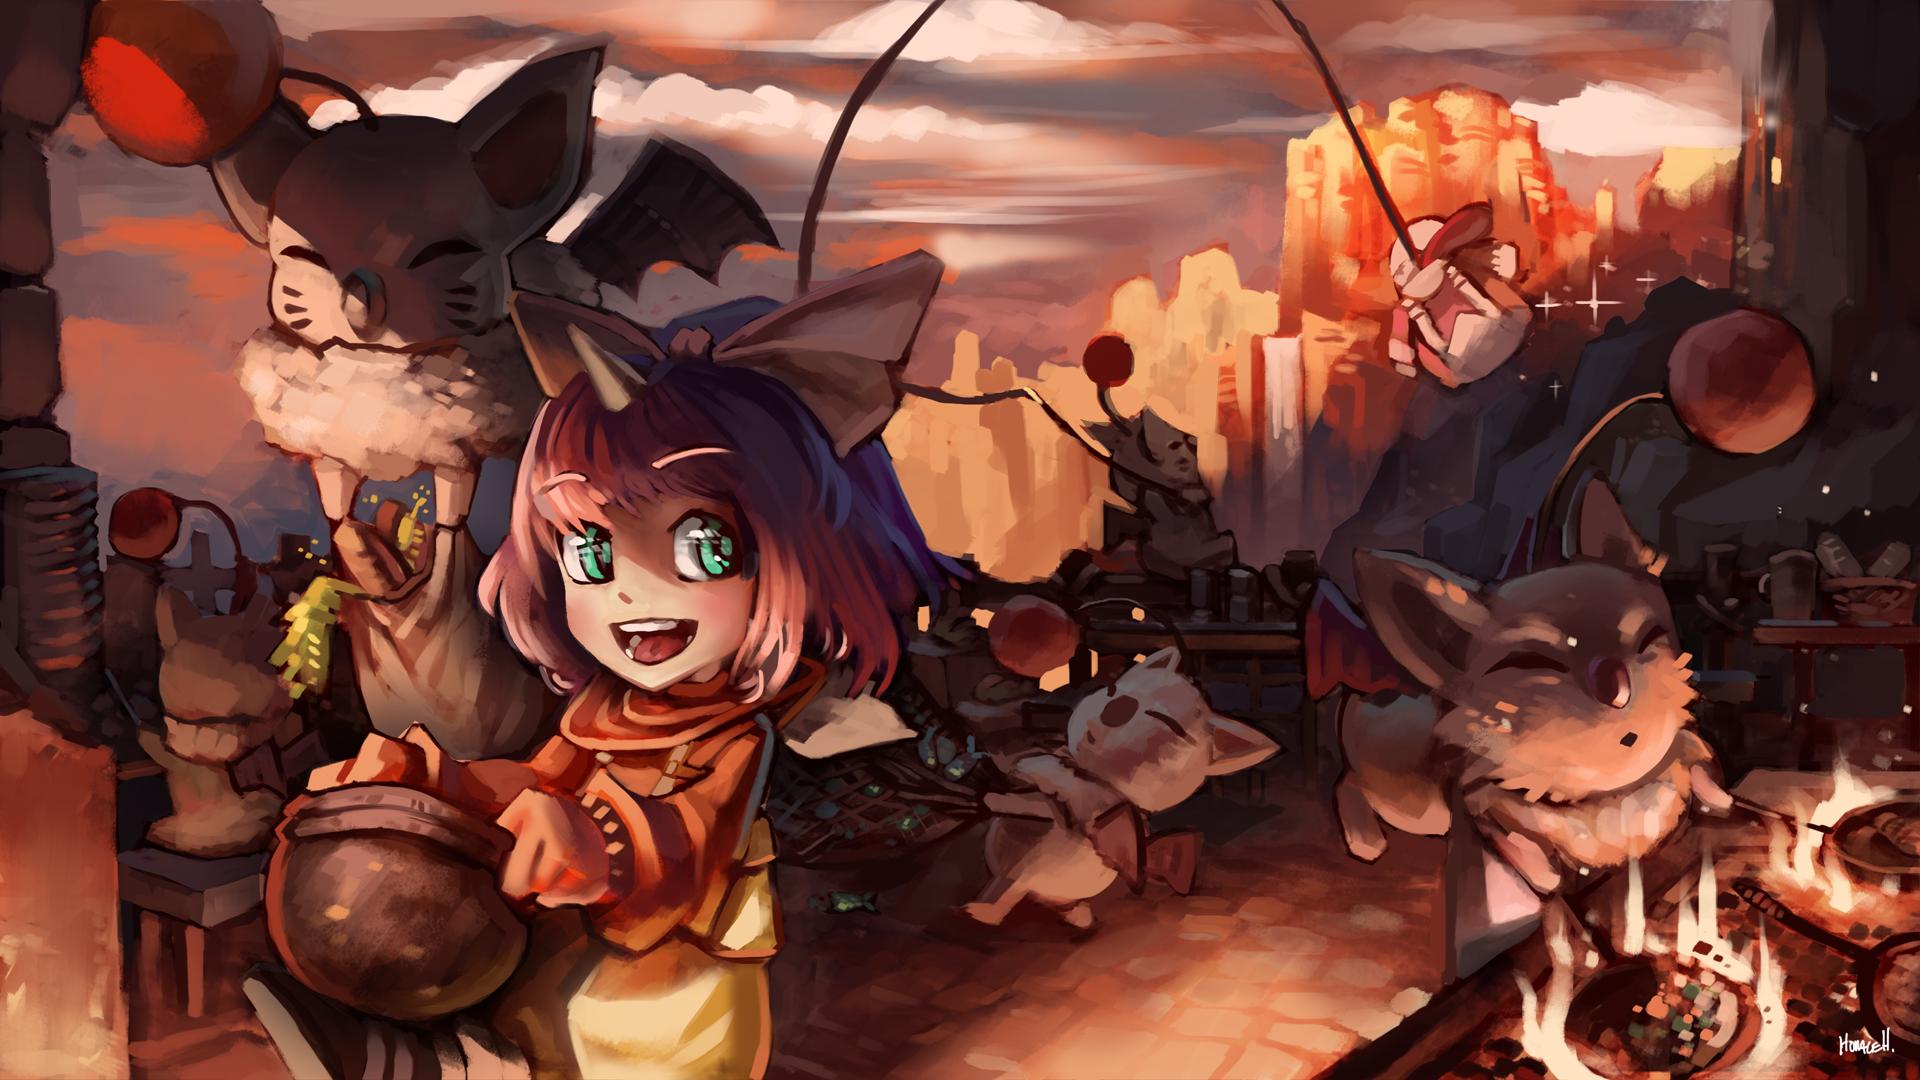 Updated  Eiko And Her Moogles By Hozure On DeviantArt